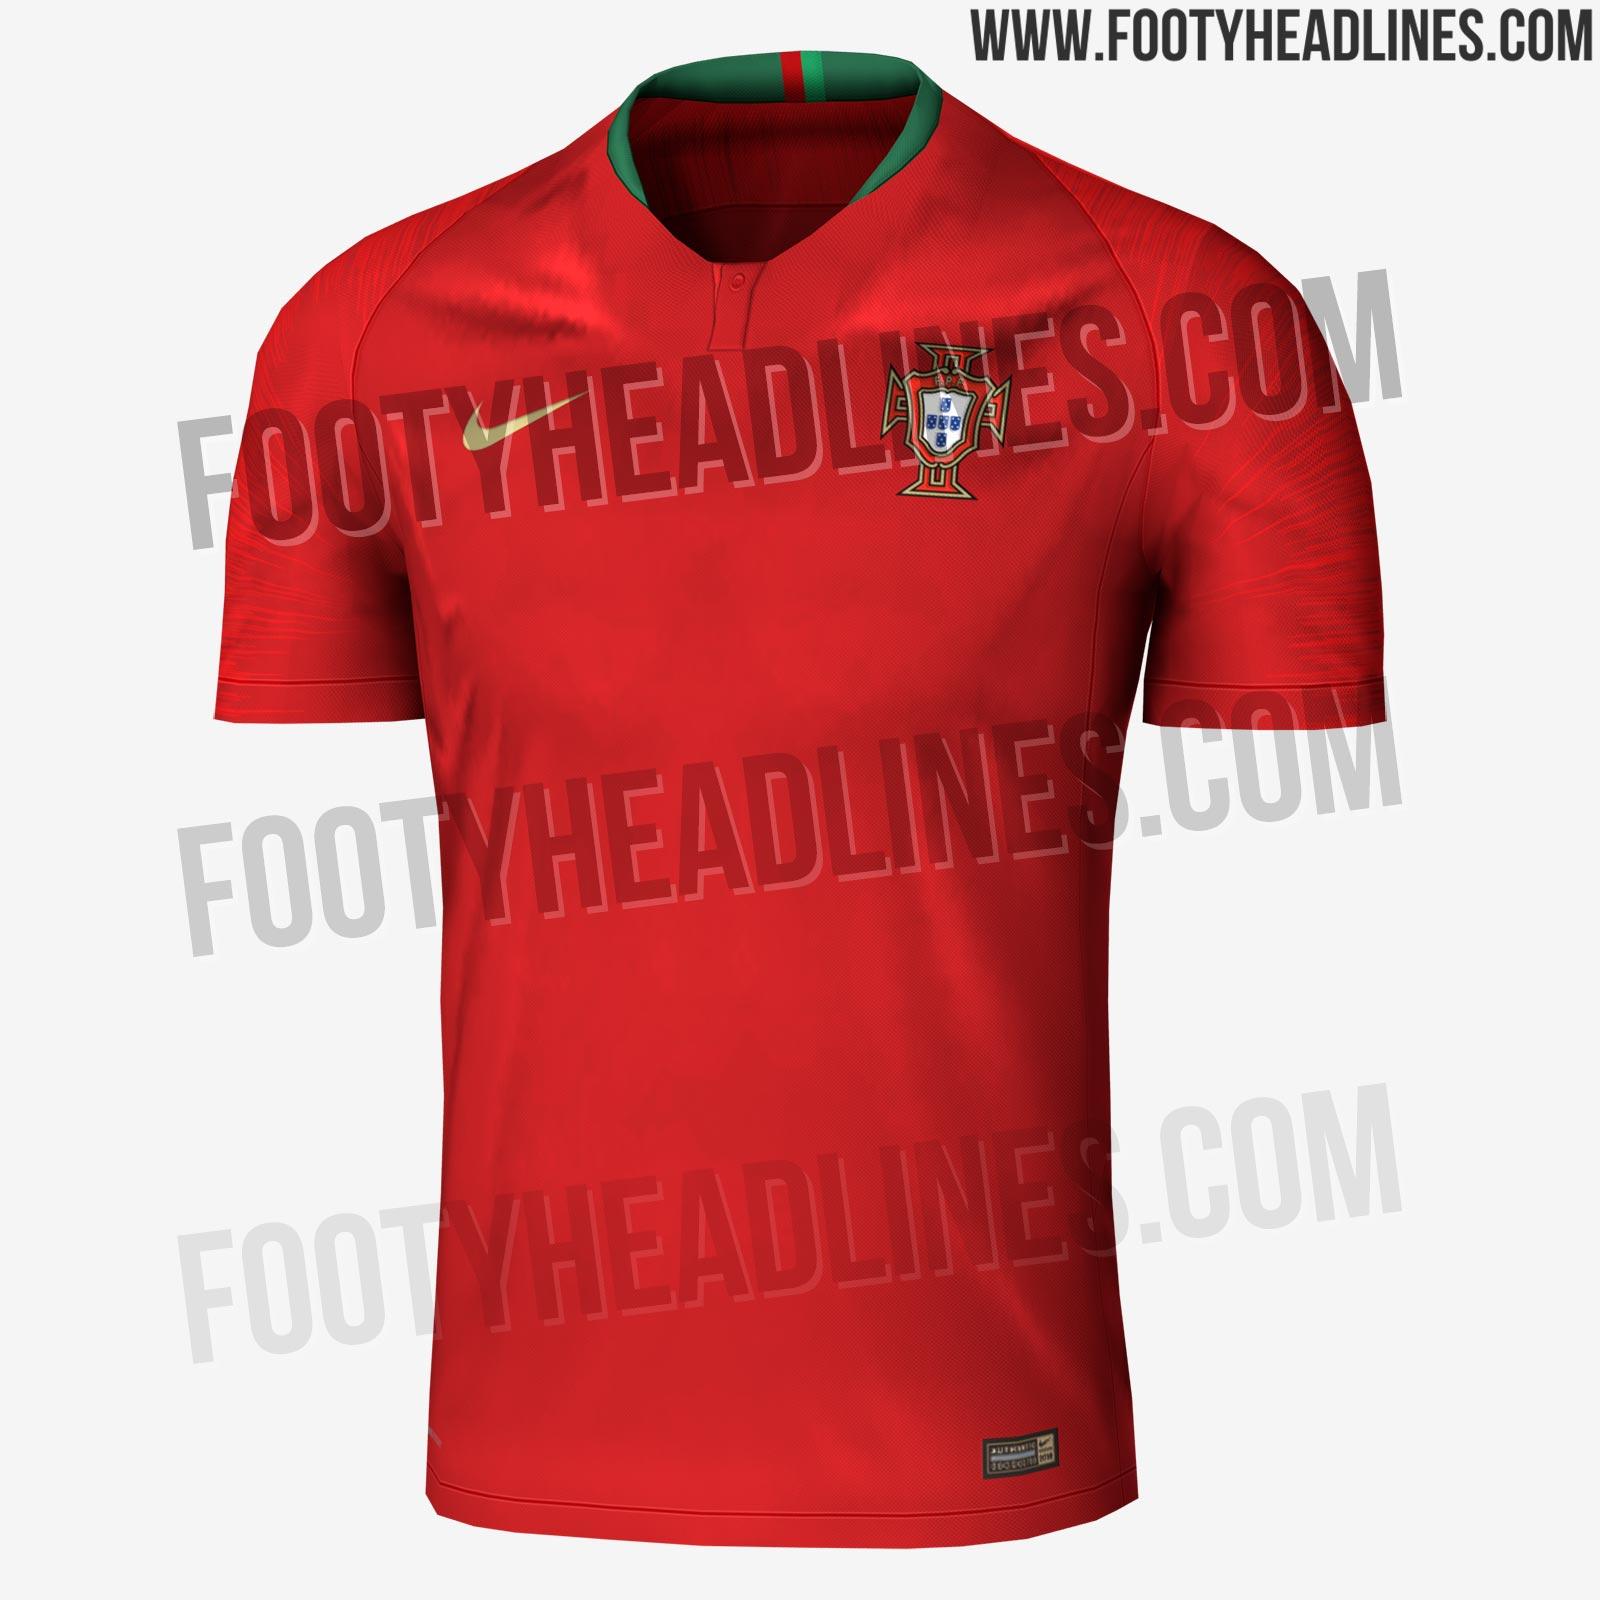 Nike Brazil Croatia England France Nigeria Poland